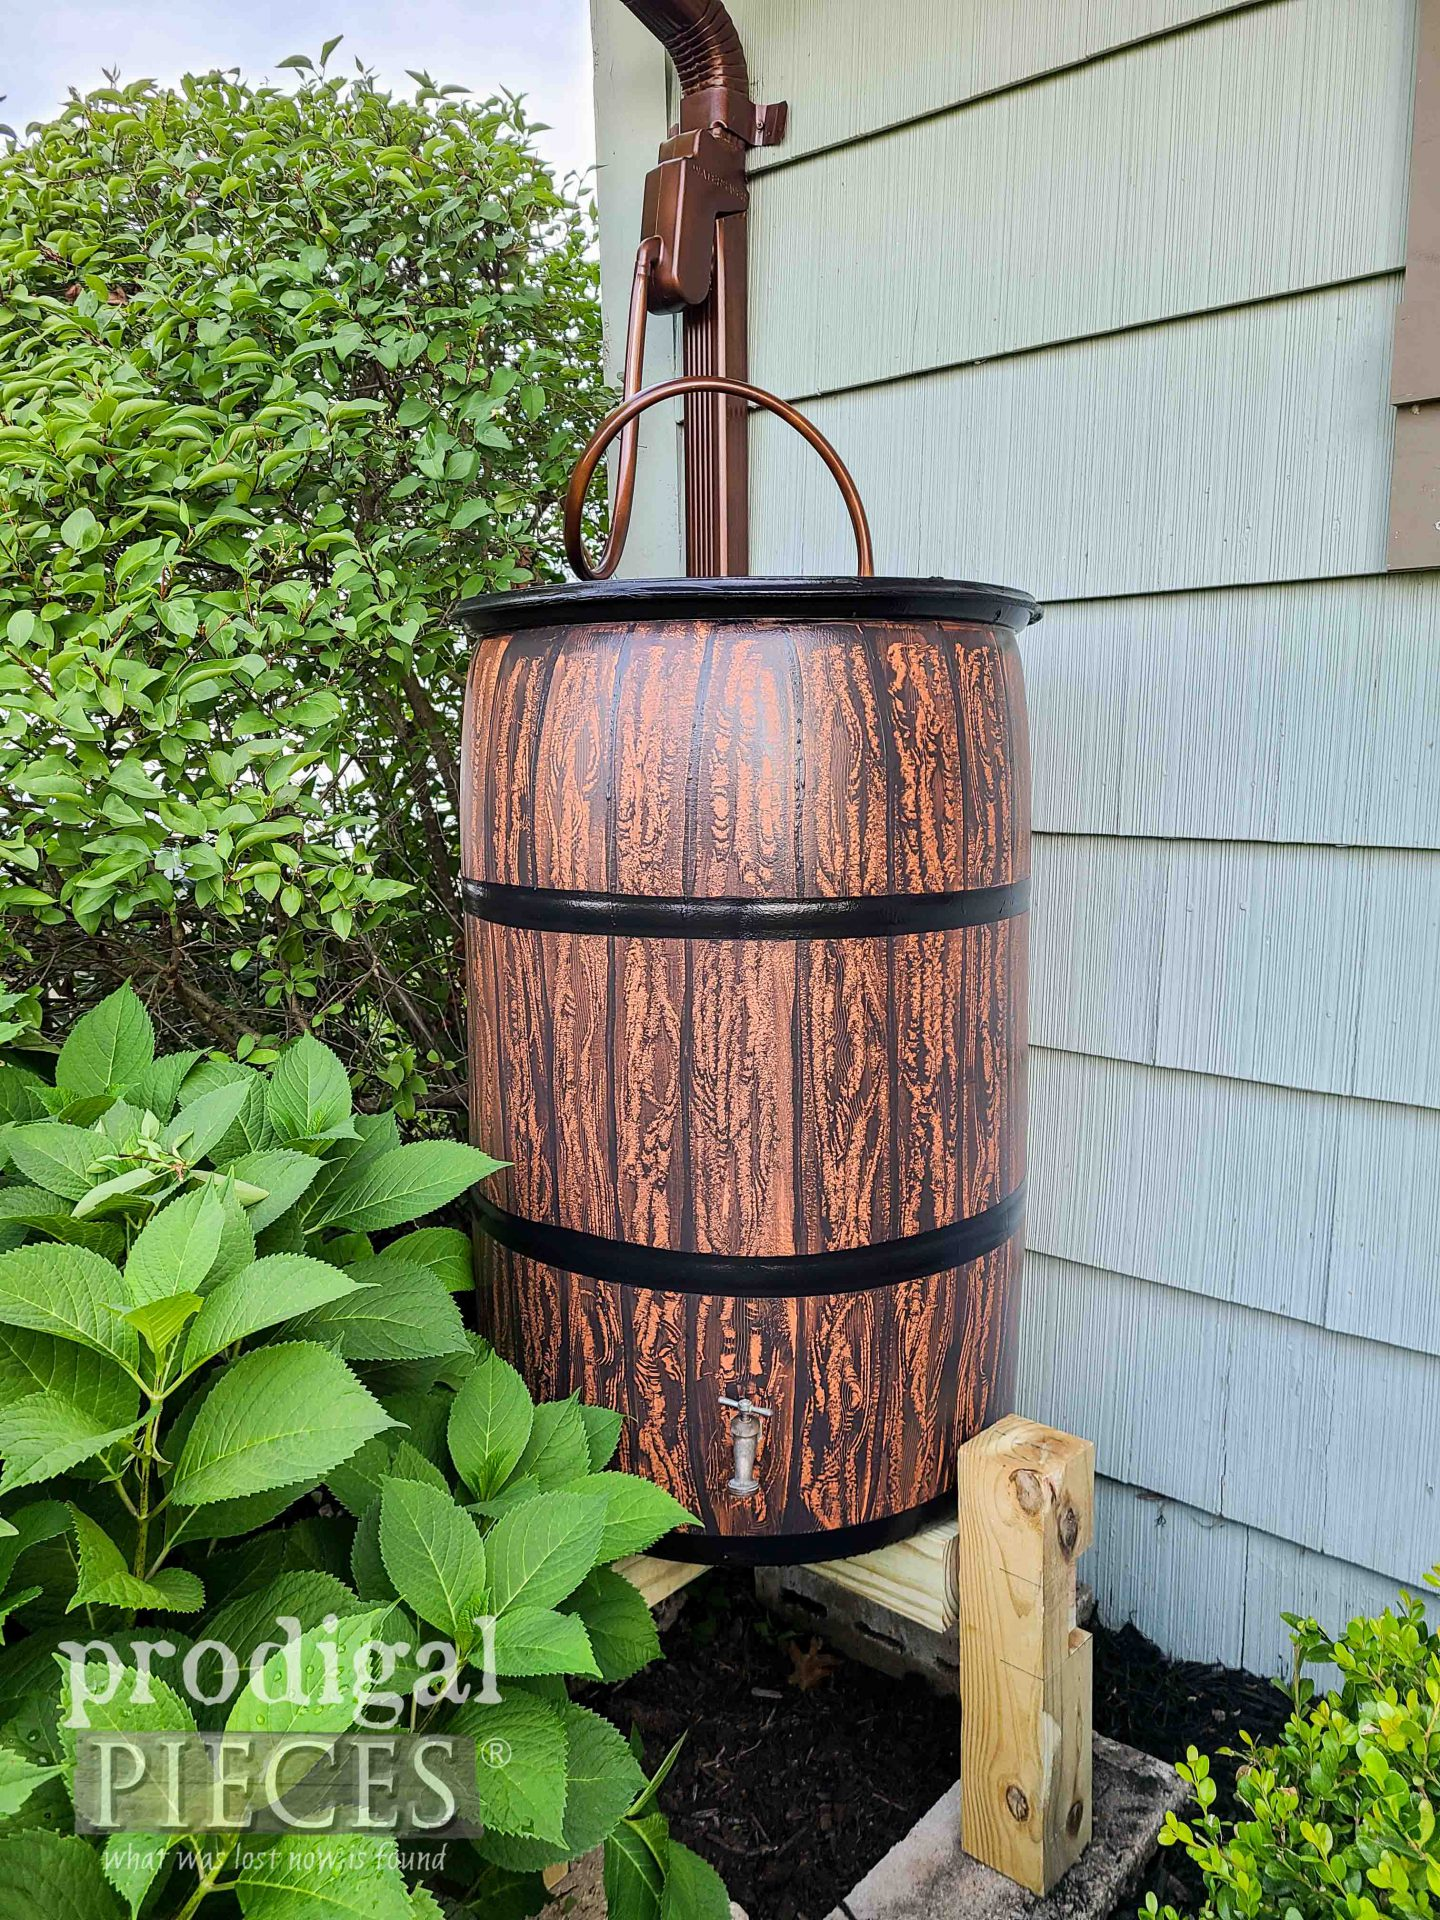 DIY Garden Rain Barrel by Larissa of Prodigal Pieces | prodigalpieces.com #prodigalpieces #diy #garden #selfsufficient